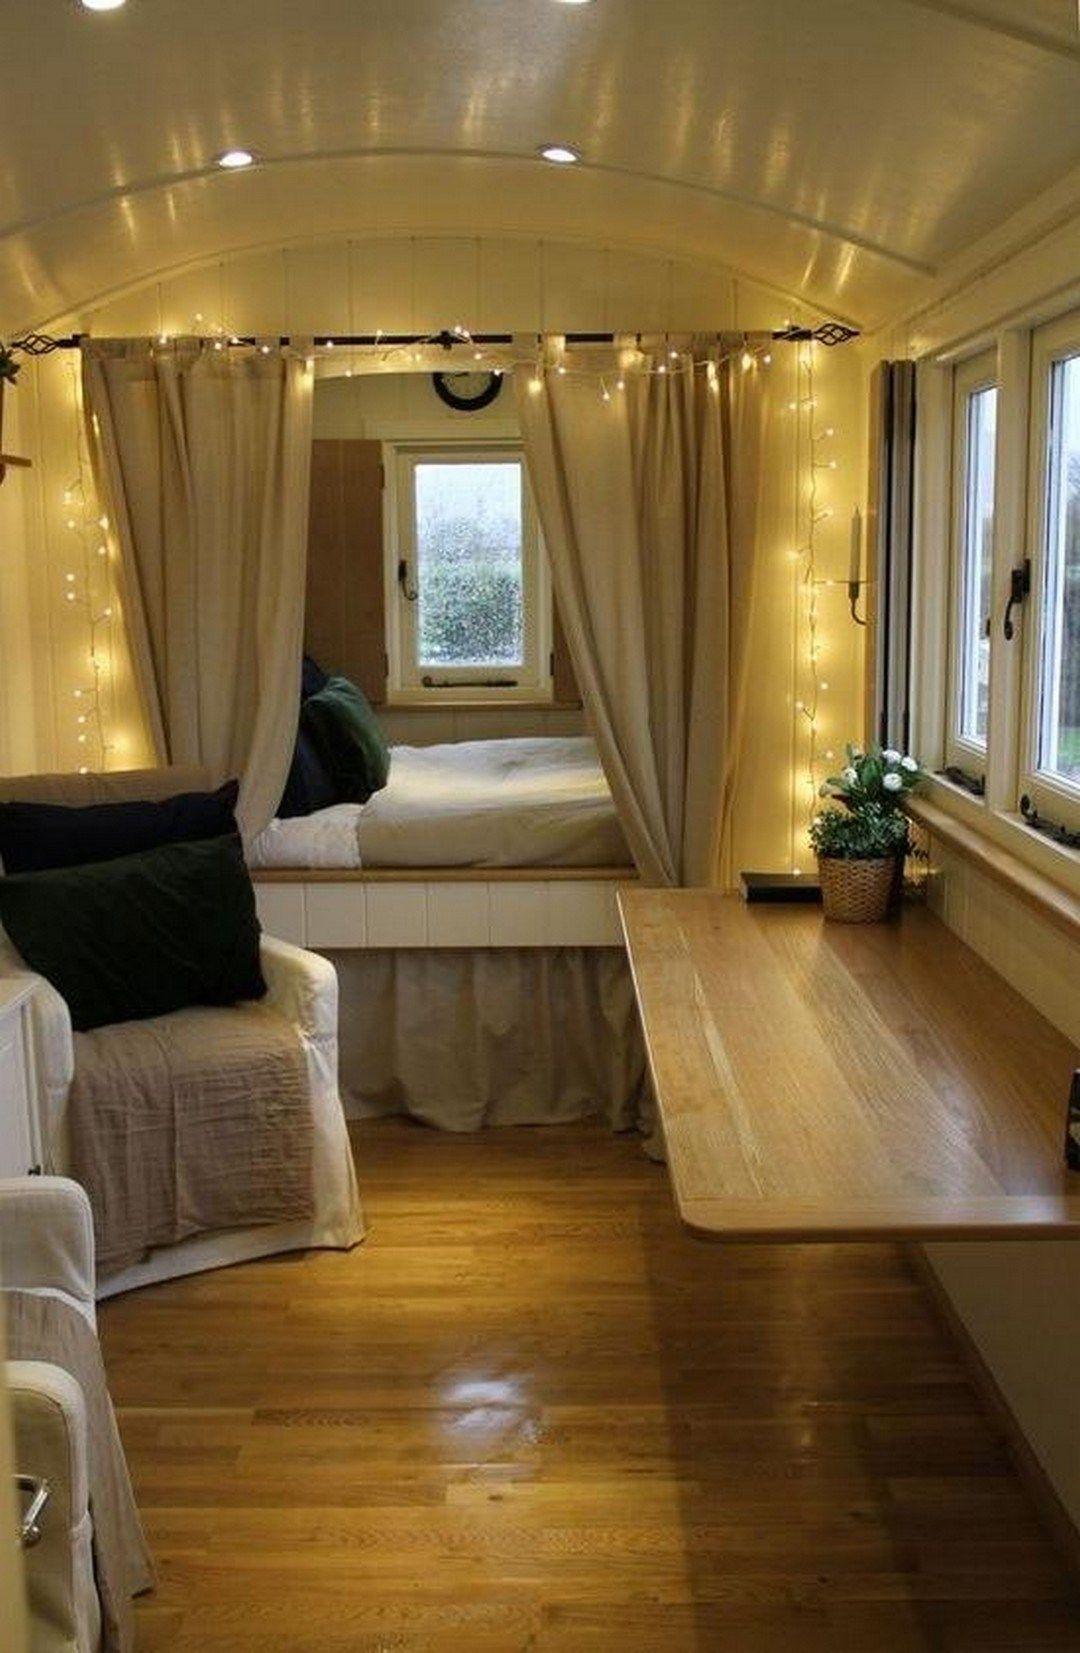 Camper Hacks And Remodel 50 Switching To LED Lighting RV Camper Van ...